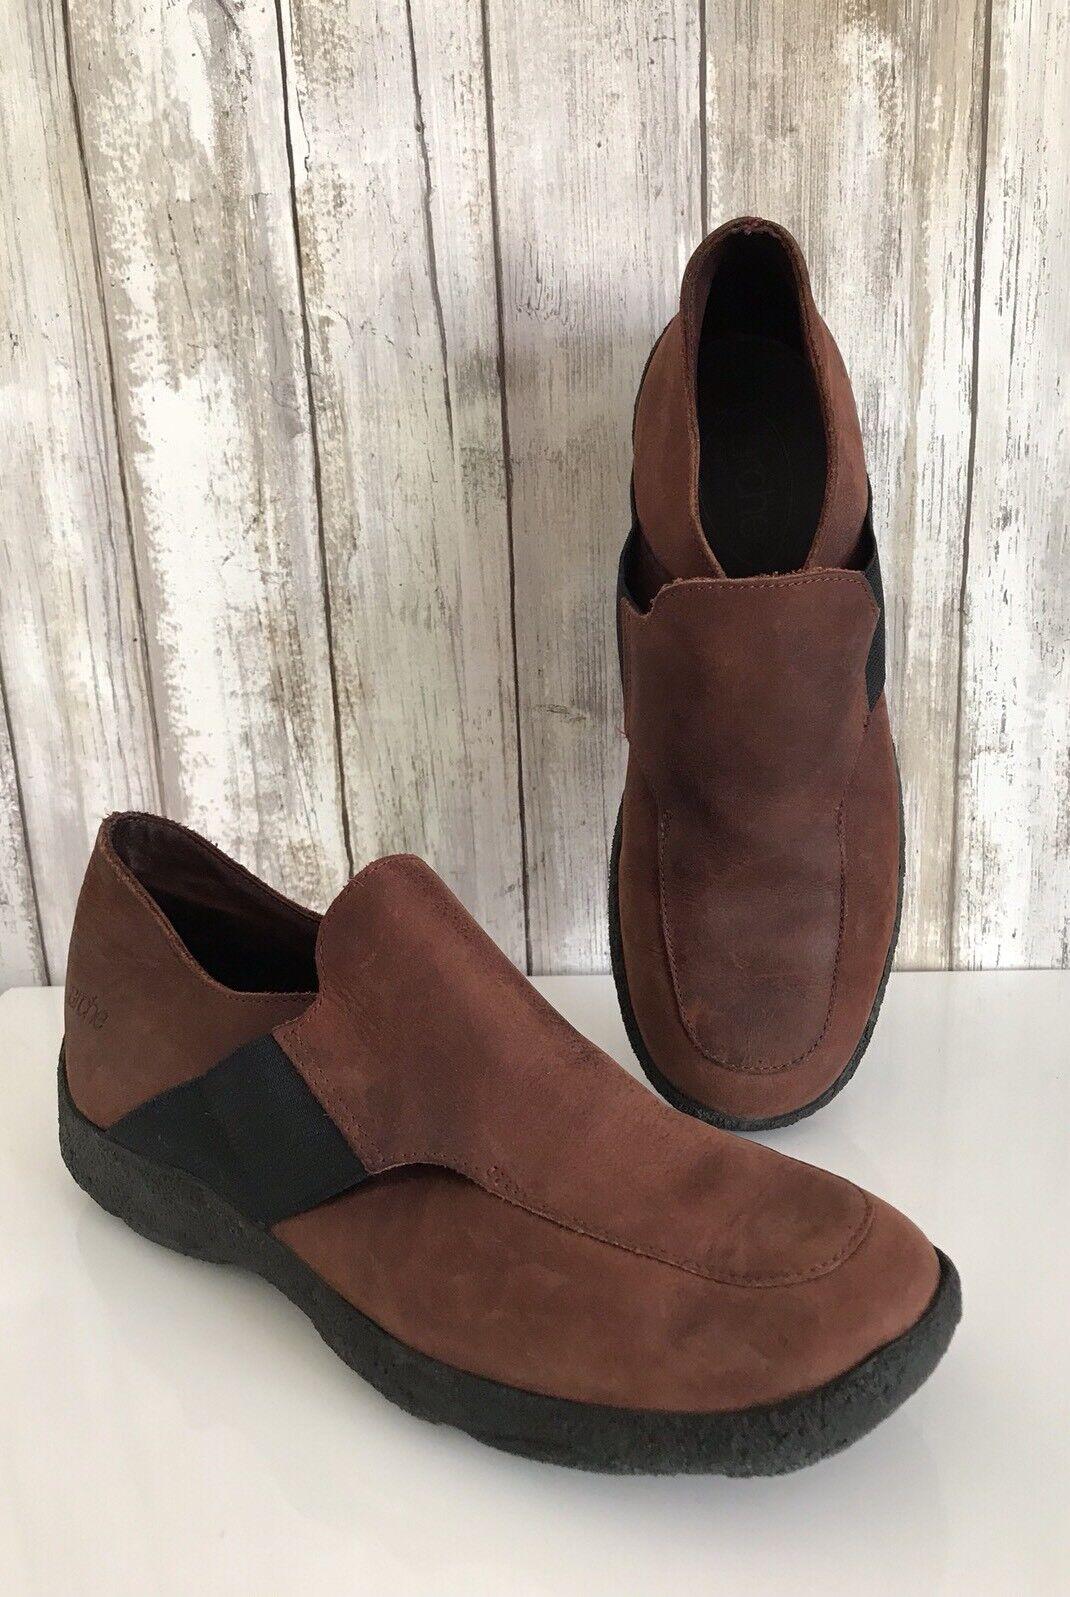 ARCHE  Slip on Marronee Nubuck Leather Elastic Flat Loafer scarpe 38 7.5 8 FRANCIA  Nuova lista